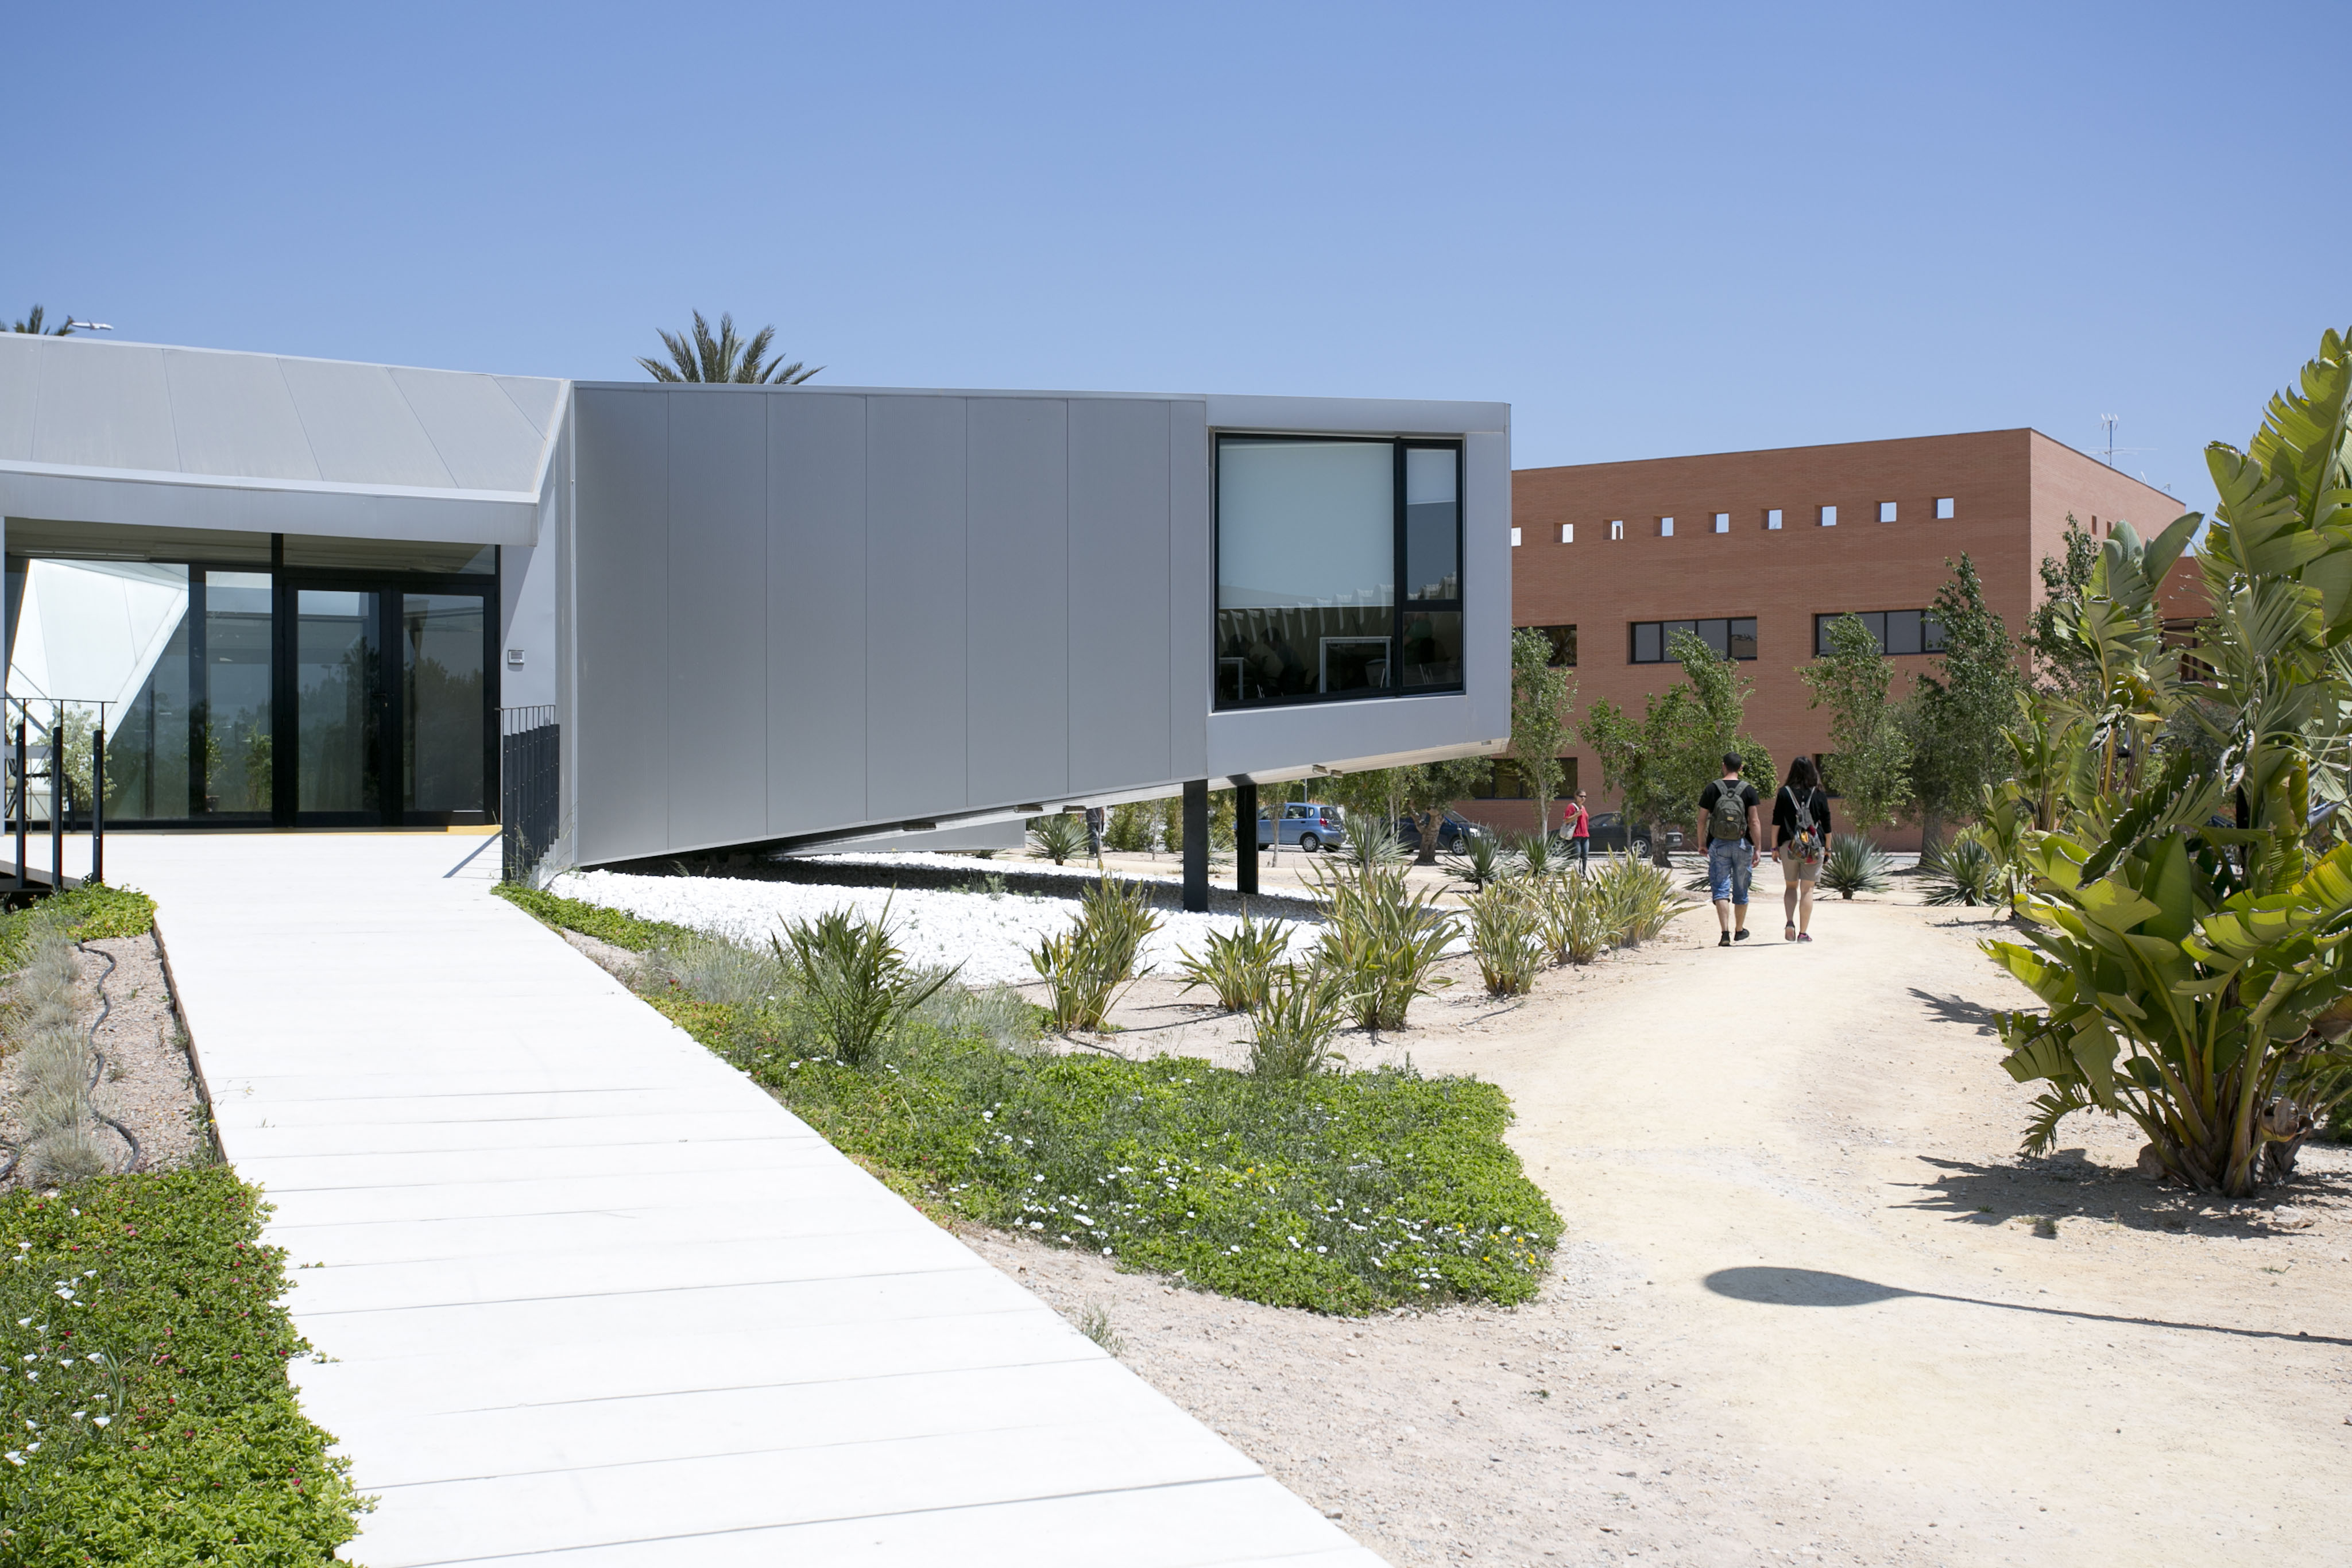 Campus-Elche-exteriores_K8B2457